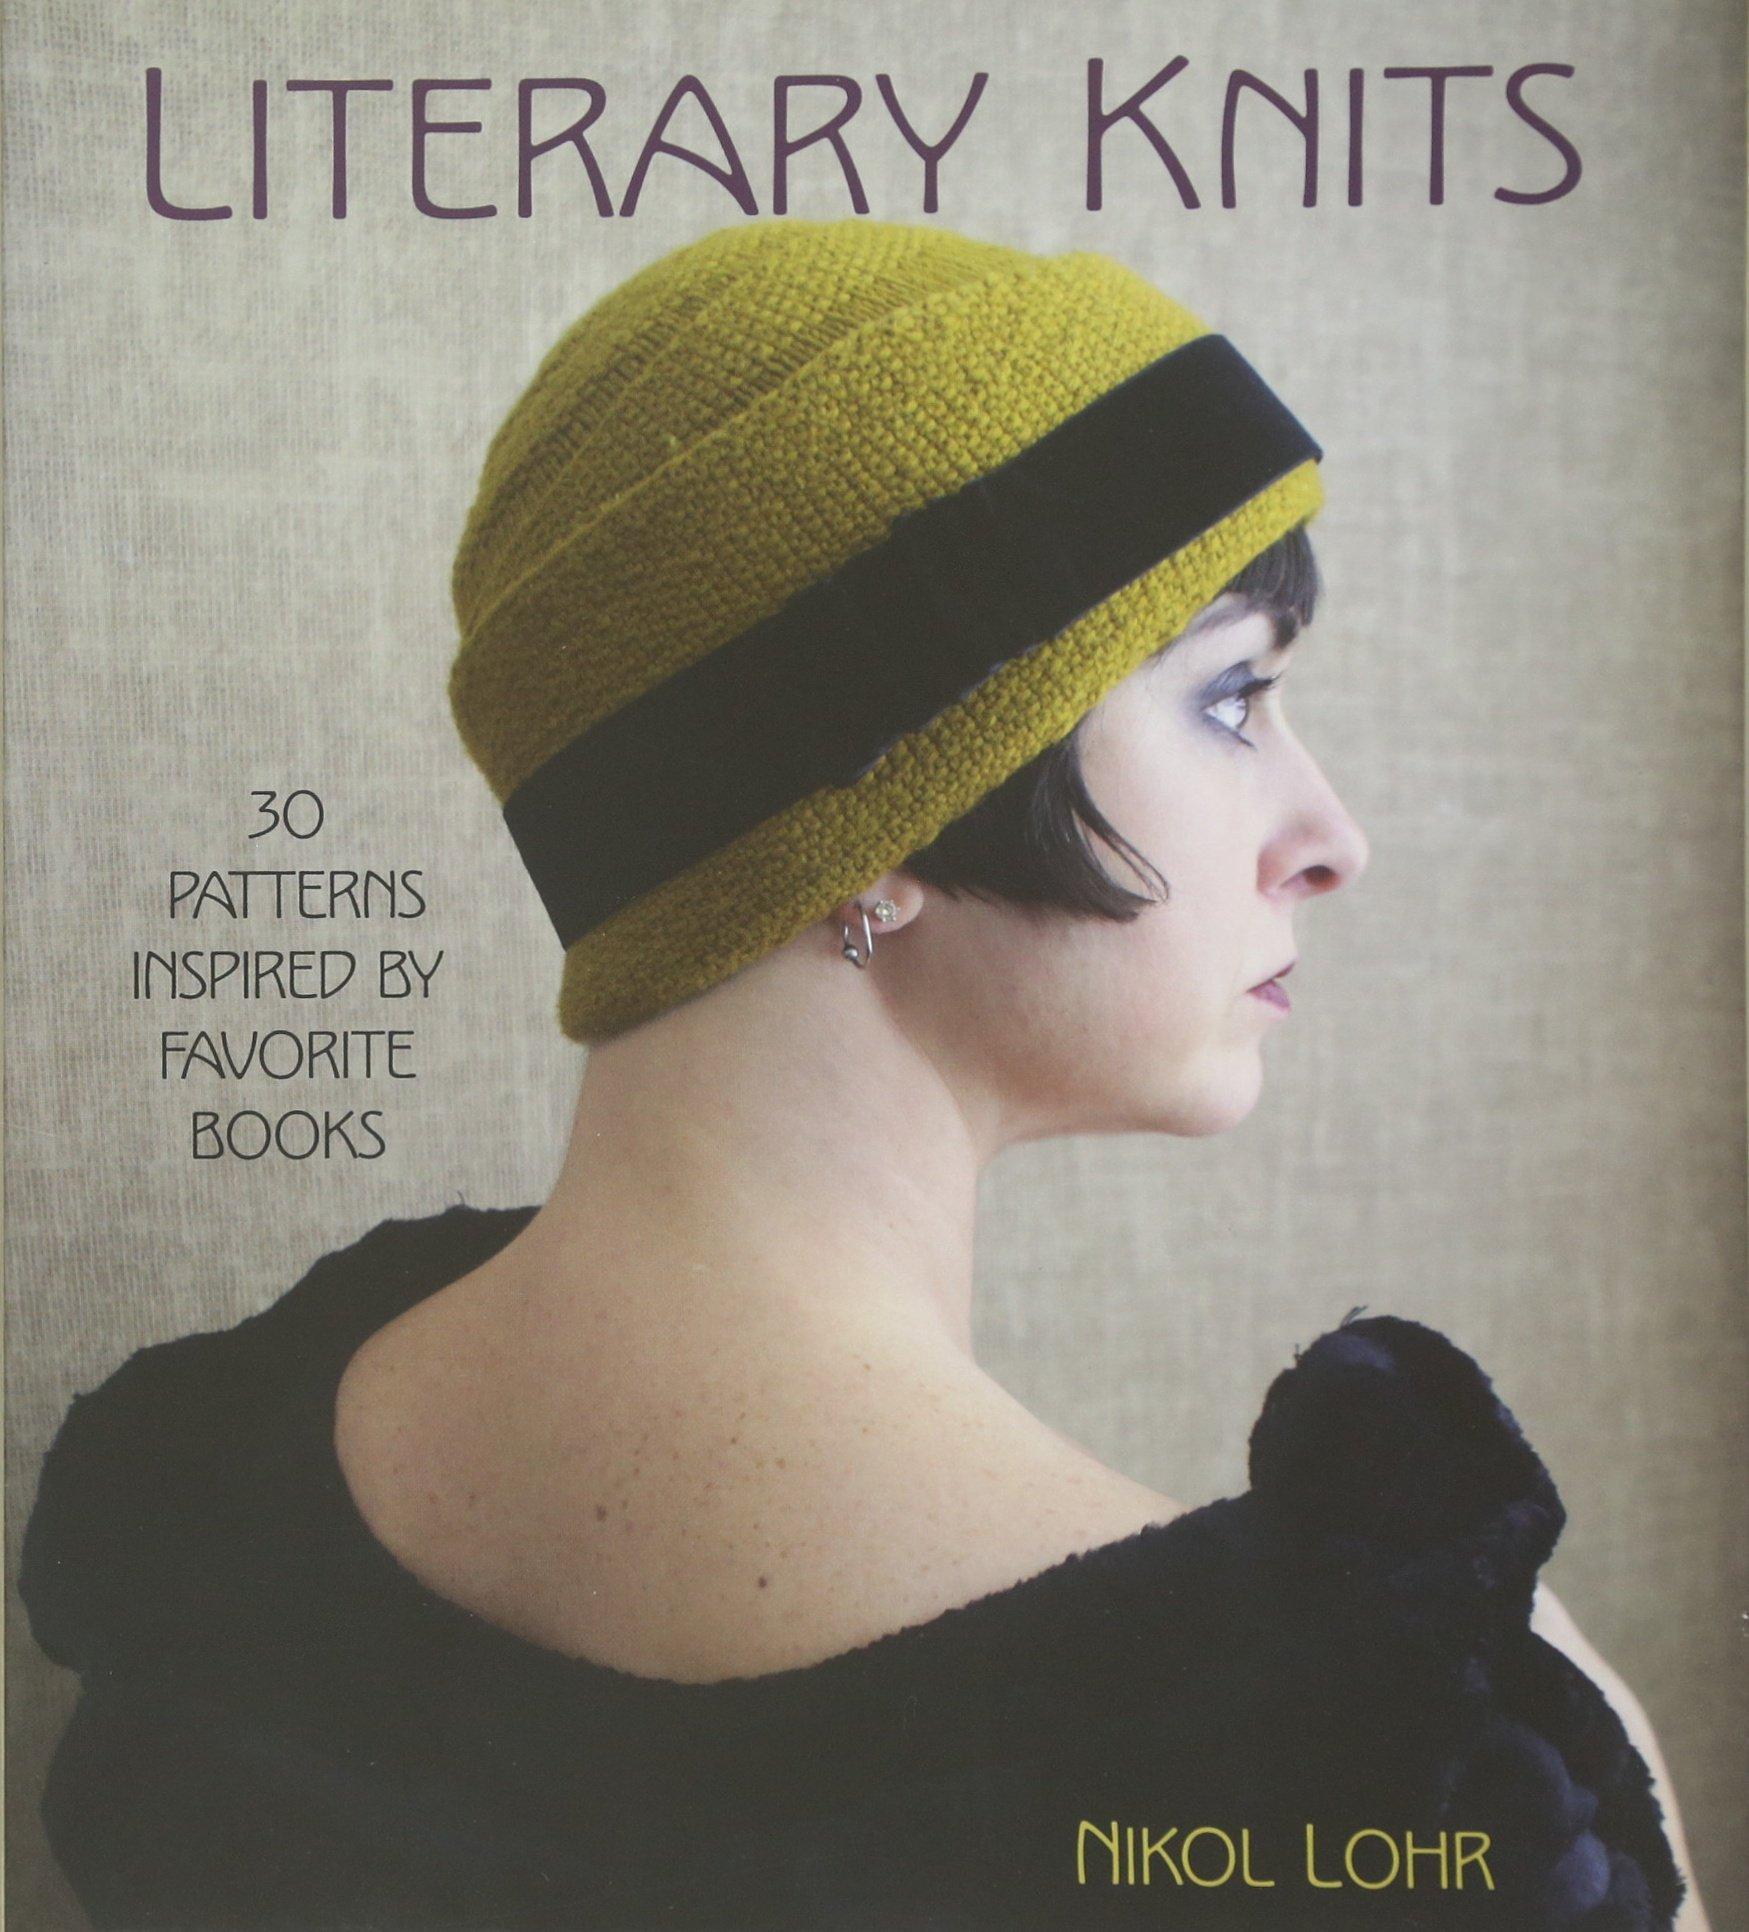 Literary Knits 30 Patterns Inspired By Favorite Books Nikol Lohr